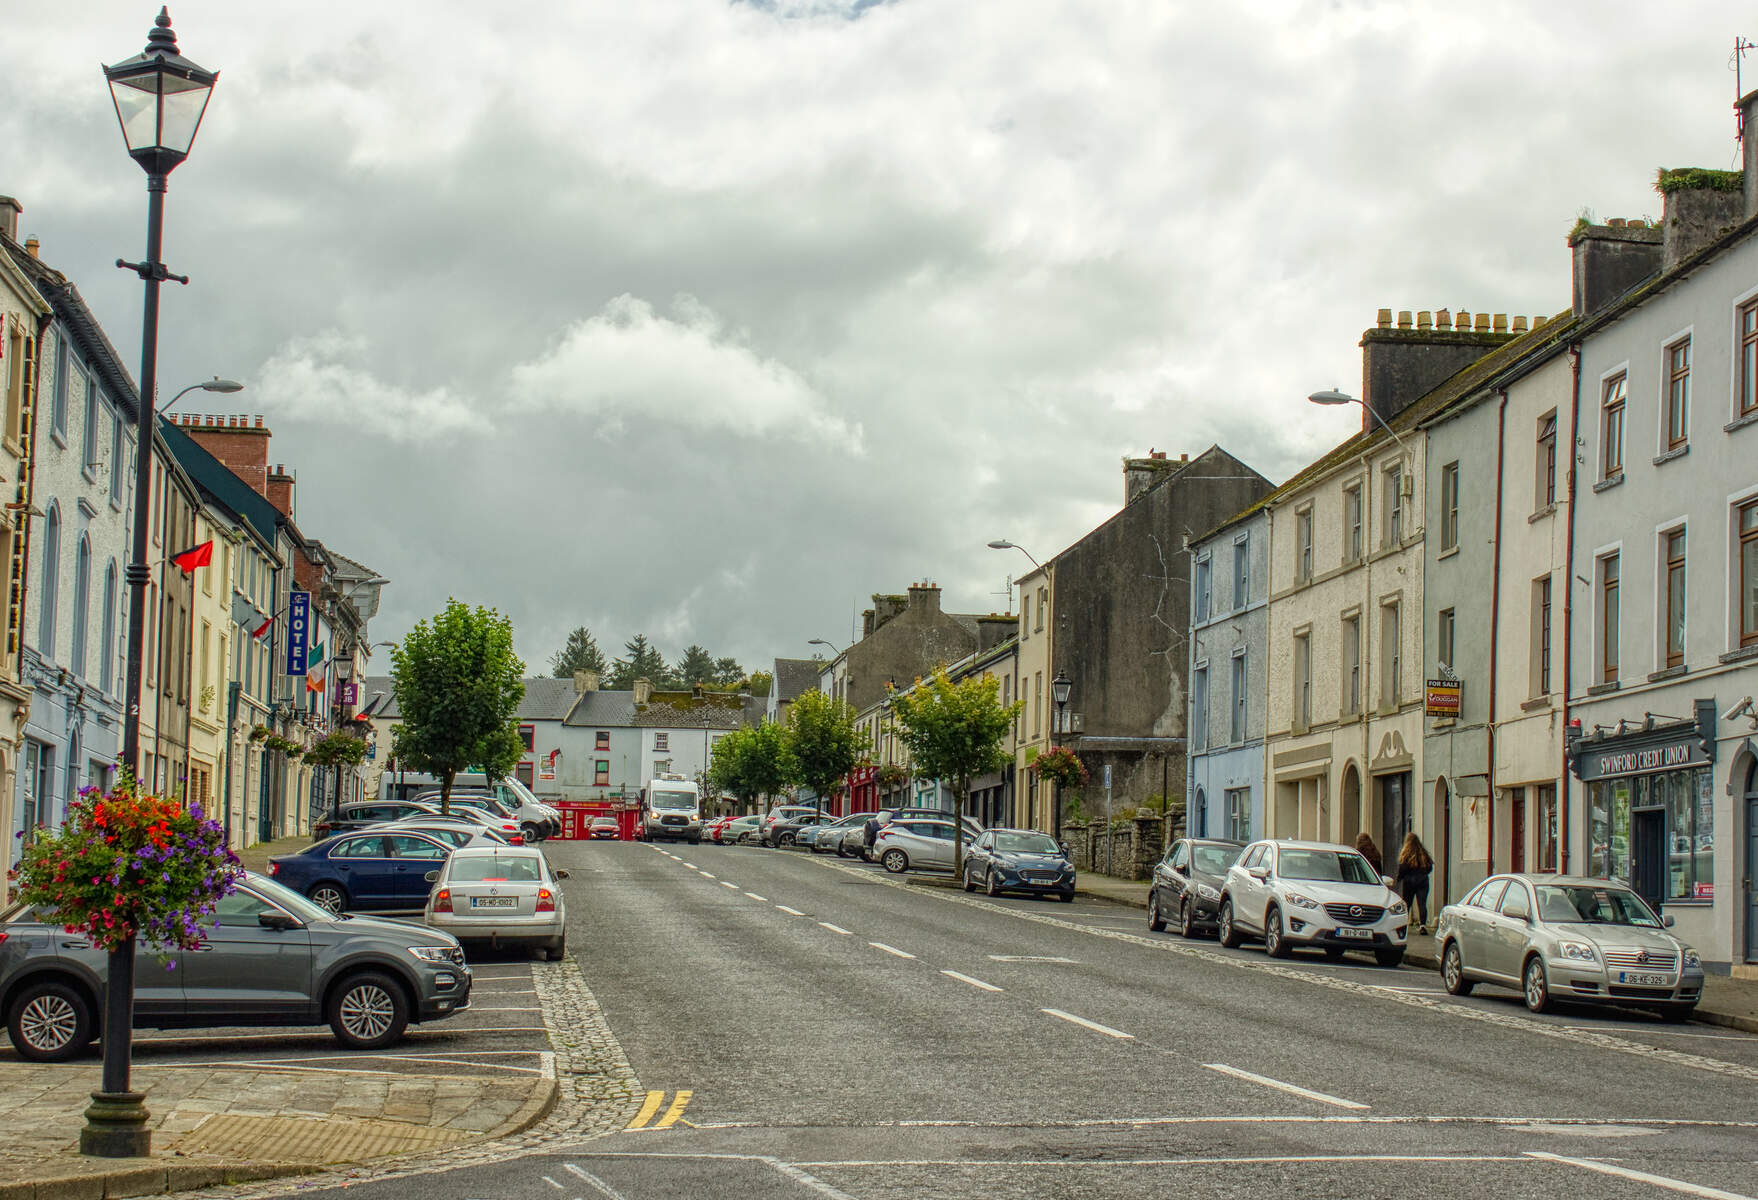 Main St, Swinford, Co. Mayo, Ireland. Things to do in Swinford